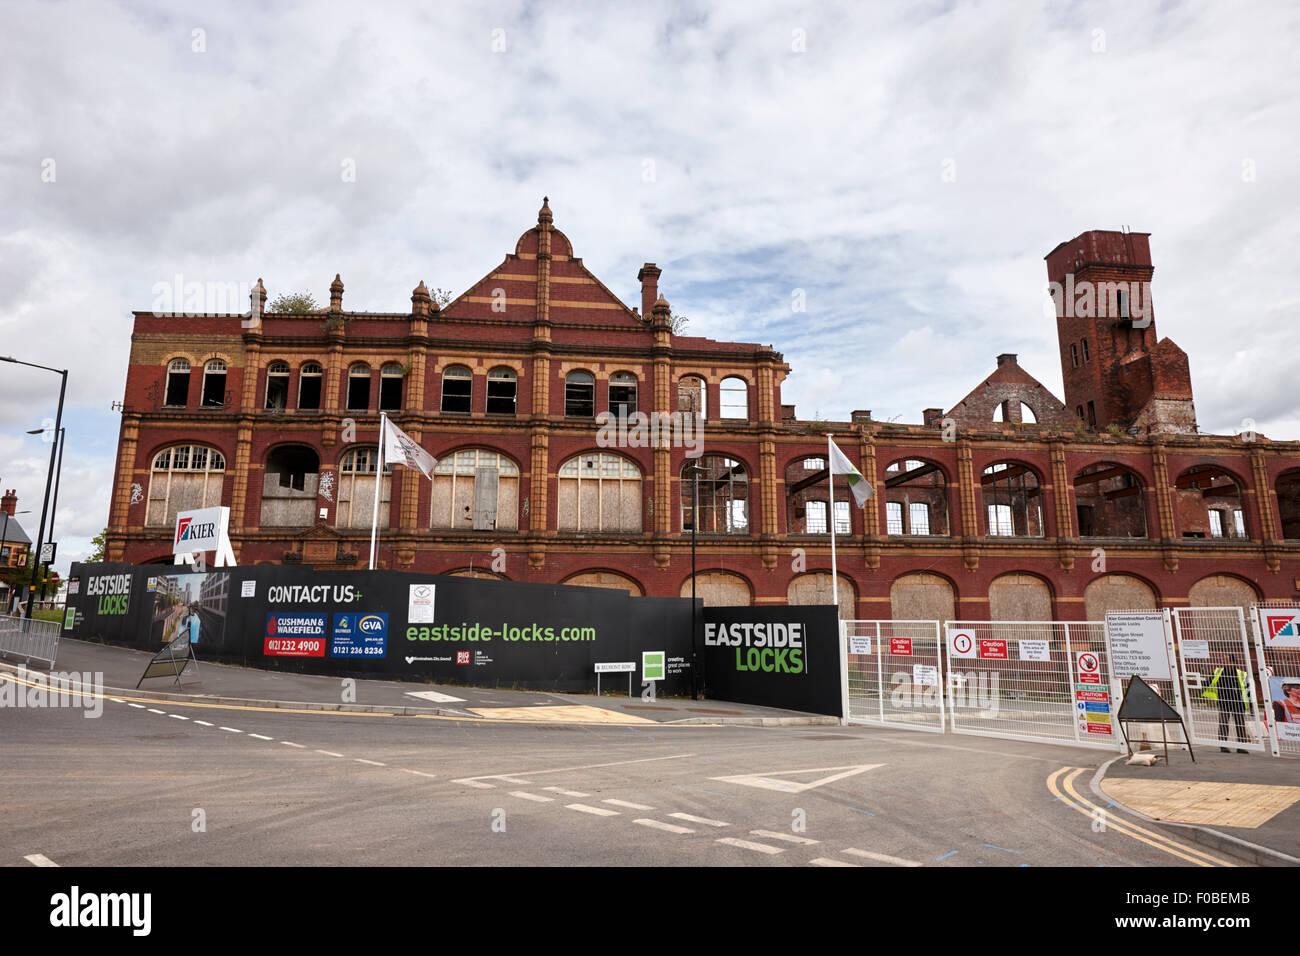 eastside locks redevelopment site Birmingham UK - Stock Image